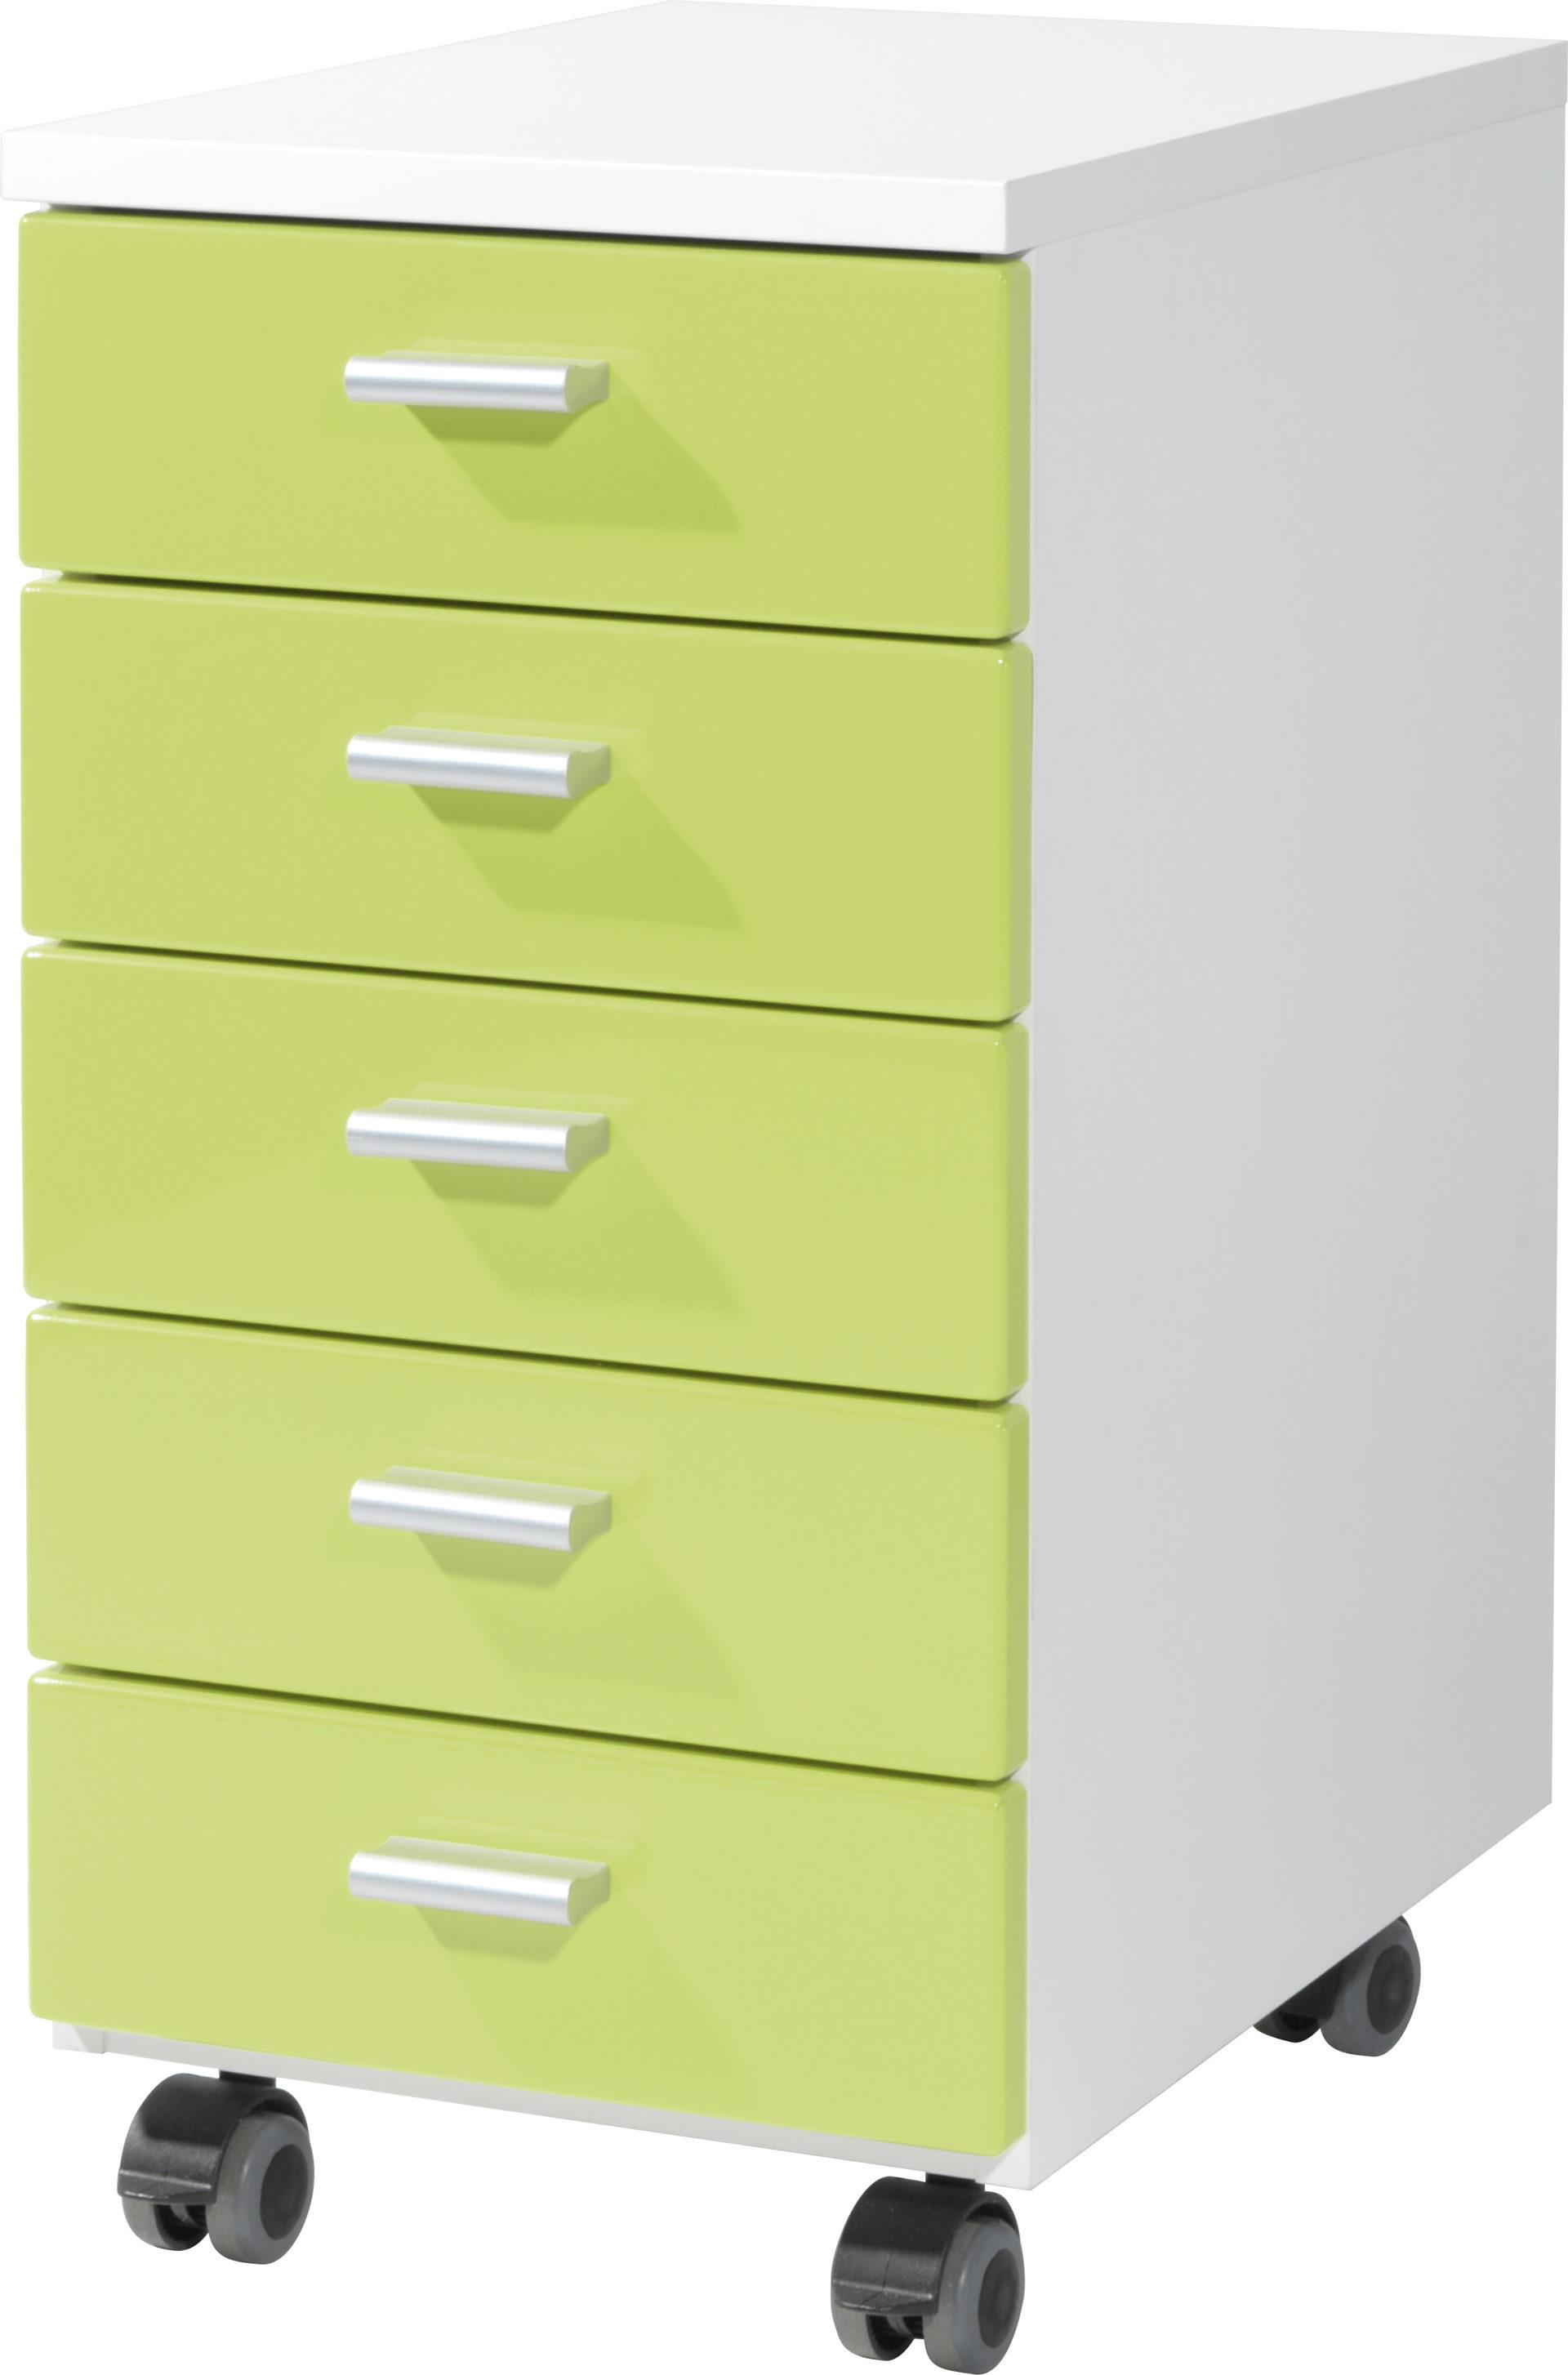 Büromöbel schrank holz  Rollcontainer 4099 als mobiles Büromöbel, apfelgrüne ...